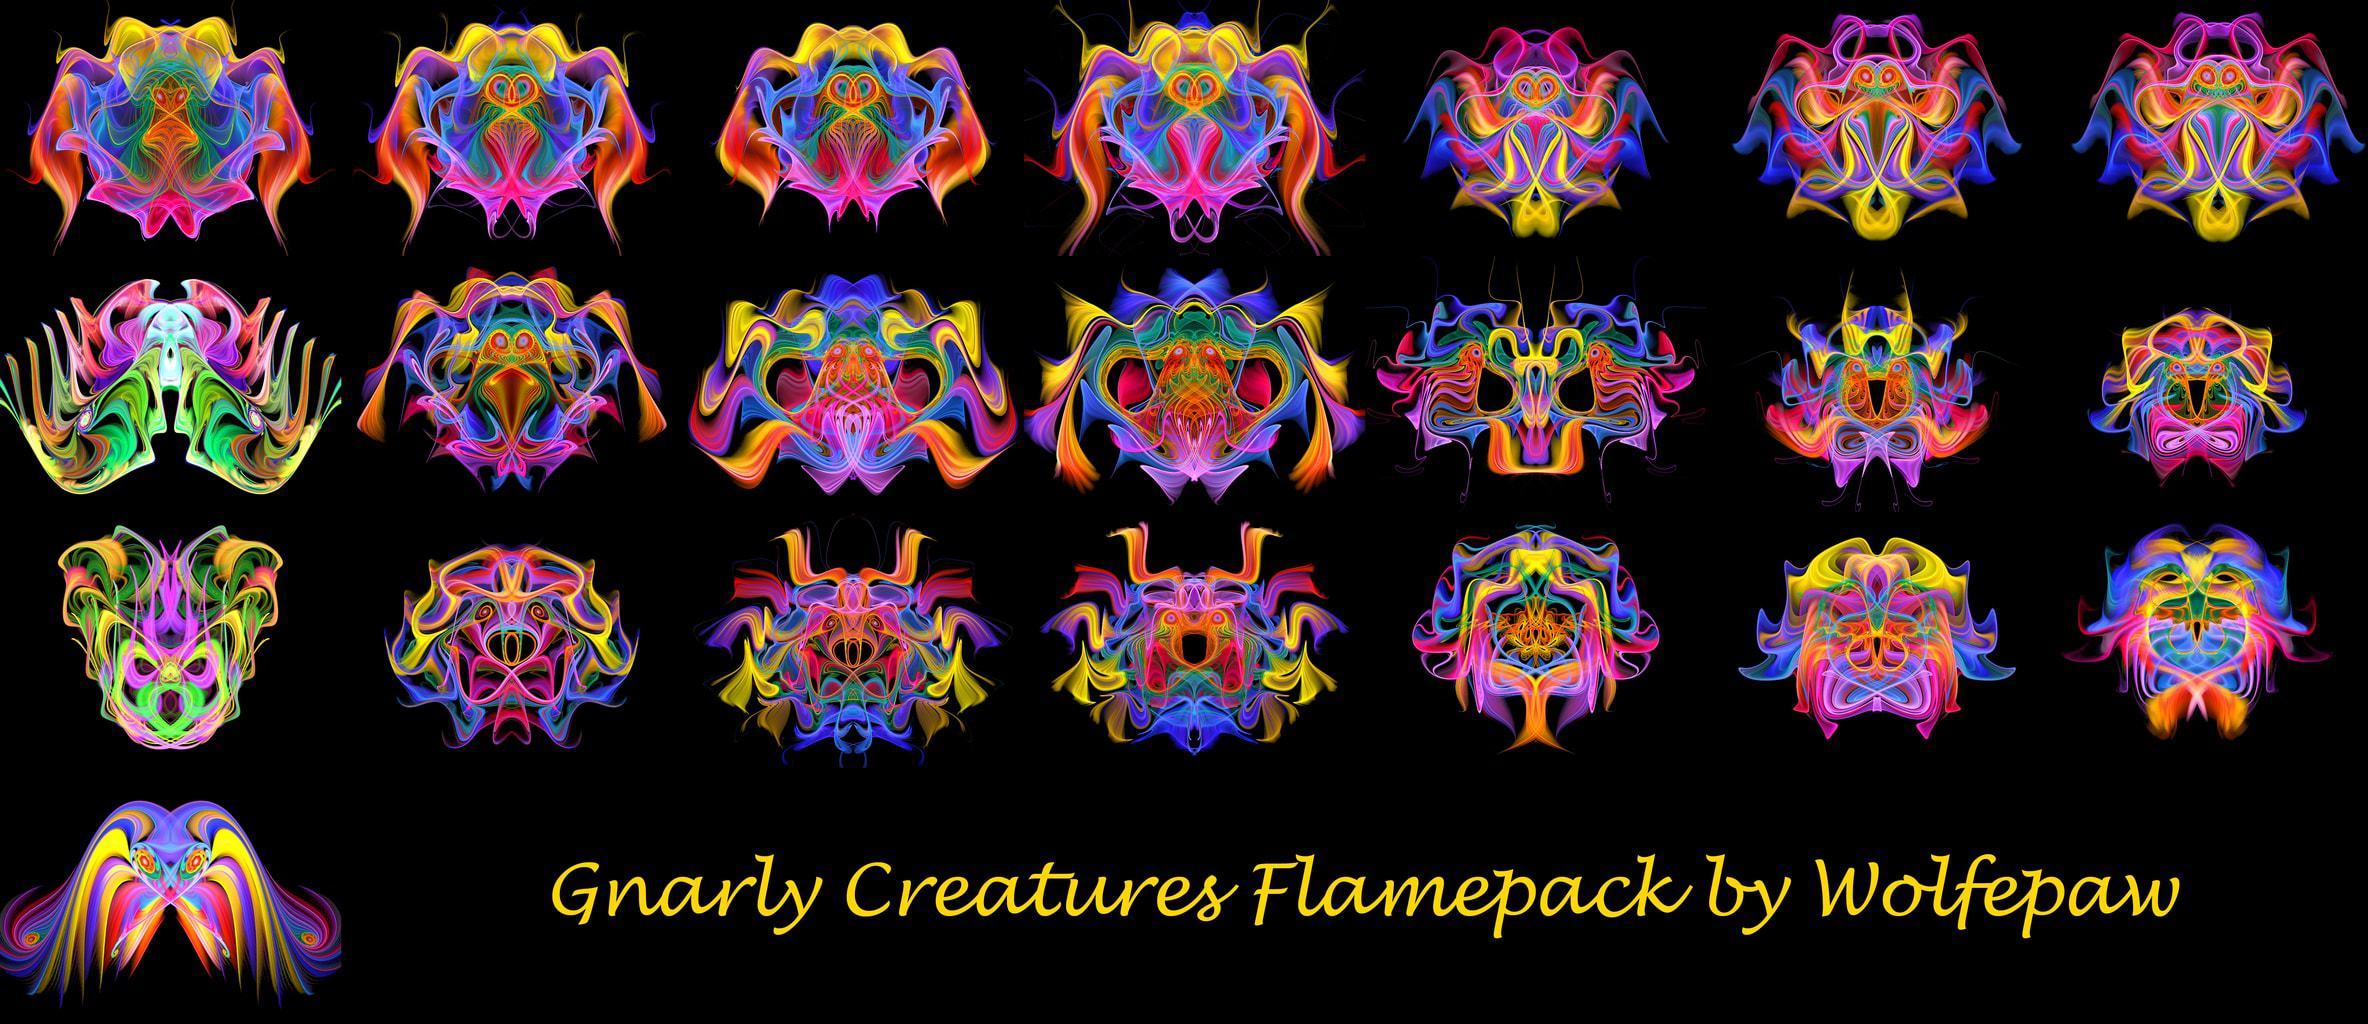 Gnarl3D Flamepack Thumbs | Gnarly Creatures Flamepack